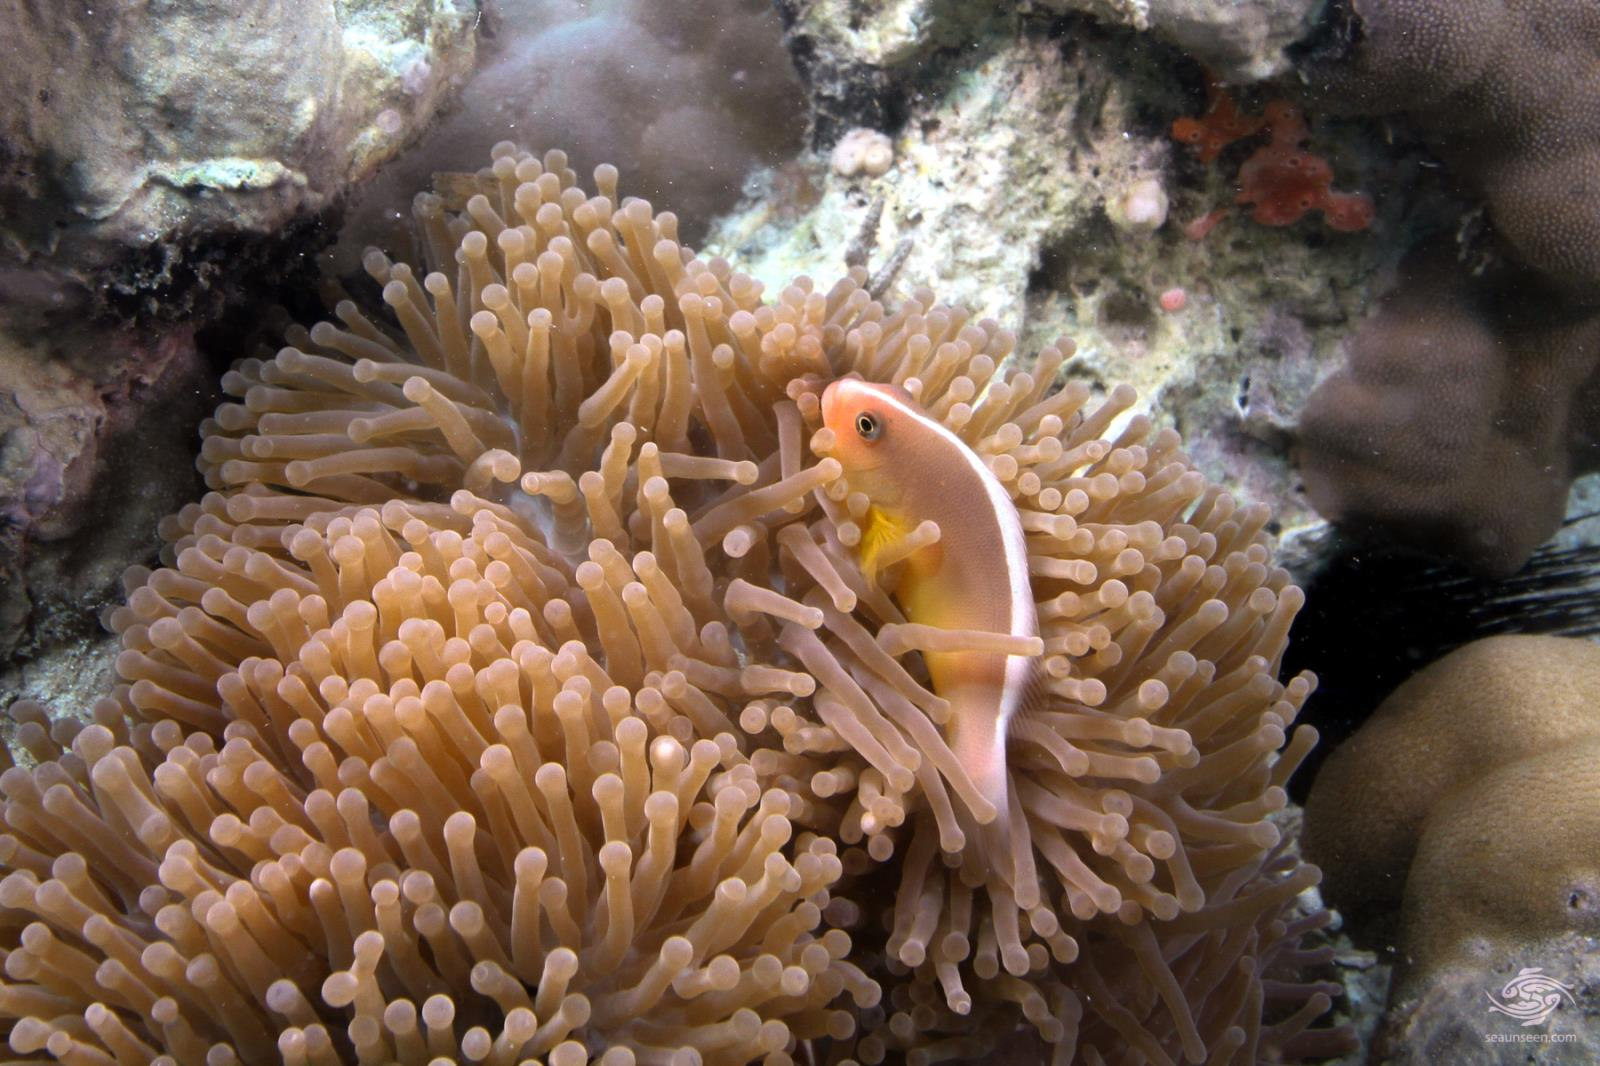 Skunk clownfish or nosestripe anemonefish Amphiprion akallopisos Tanzania 4